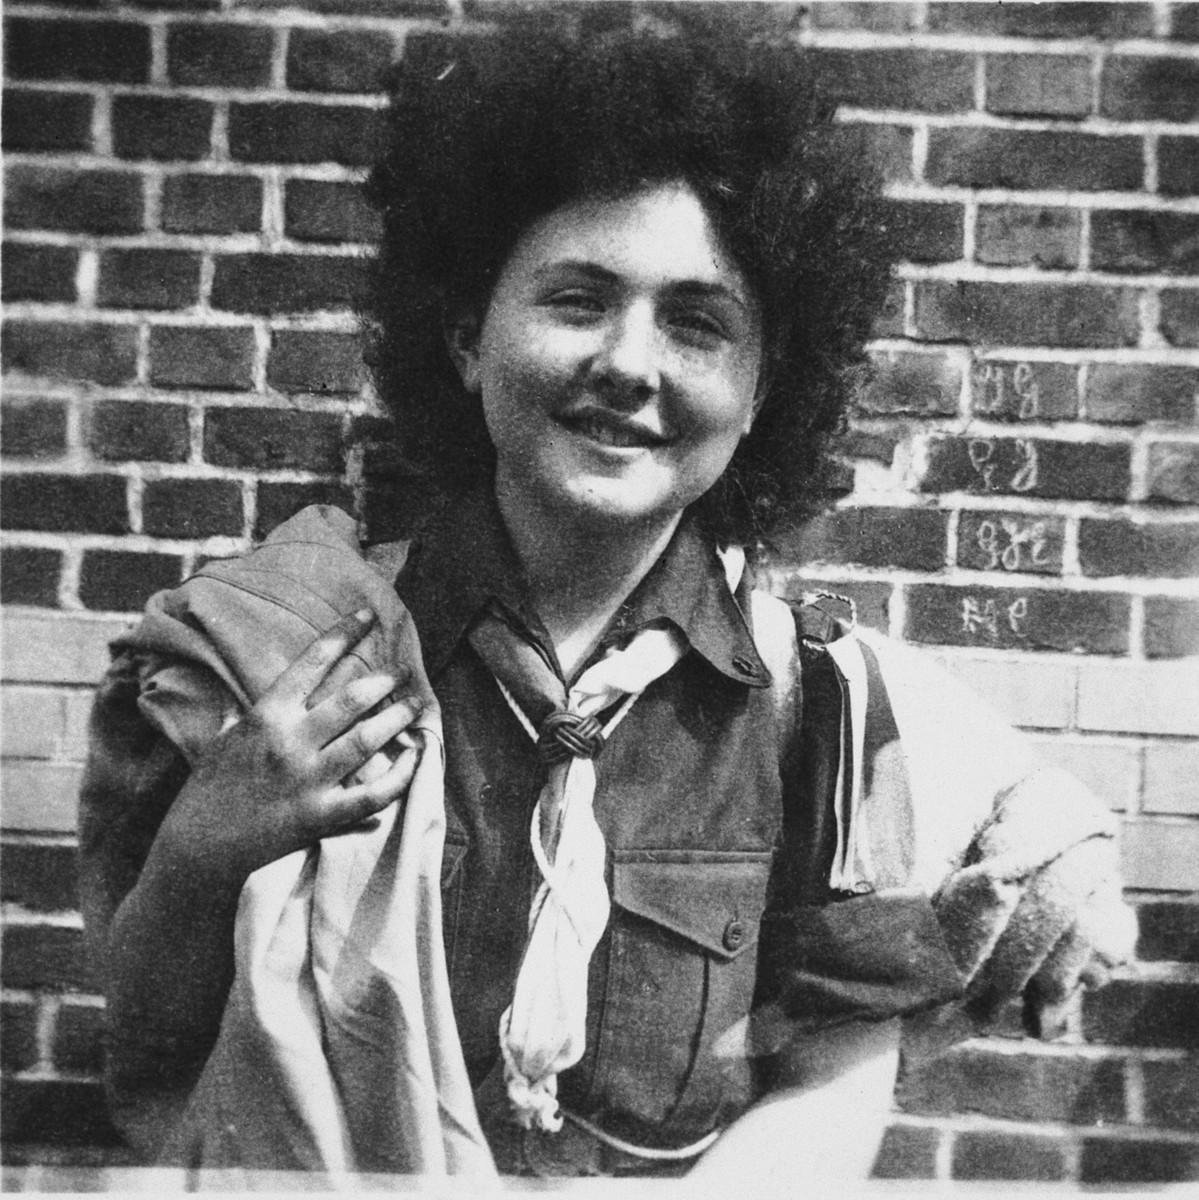 Portrait of Hena Kohn wearing her Gordonia Zionist youth movement uniform after the war.